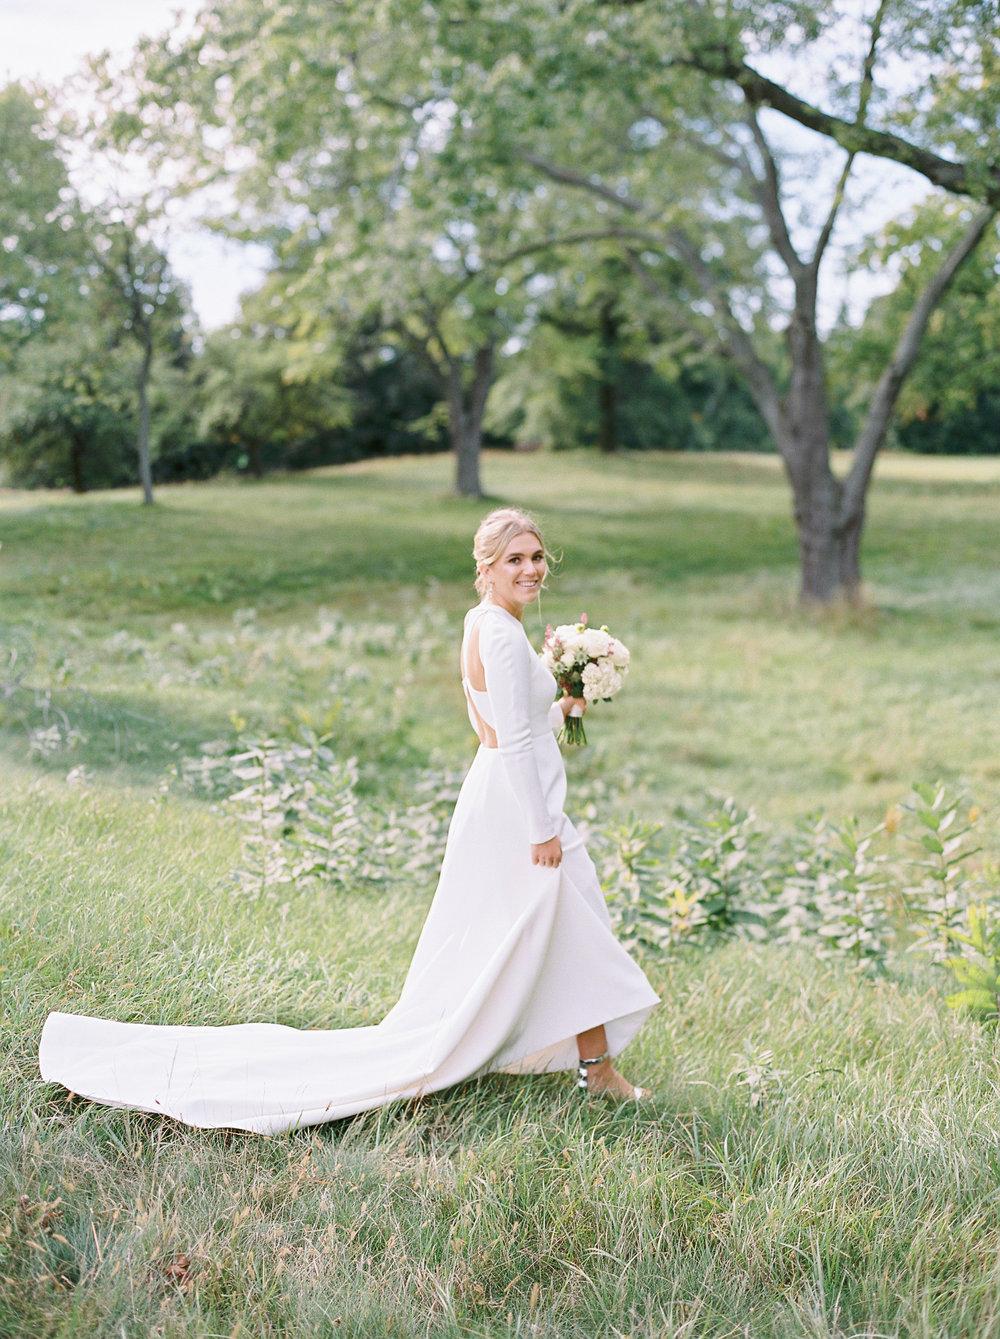 0270-Geneva-Ian-Wedding-Toronto Golf Club-When He Found Her-TorontoPhotographer.jpg